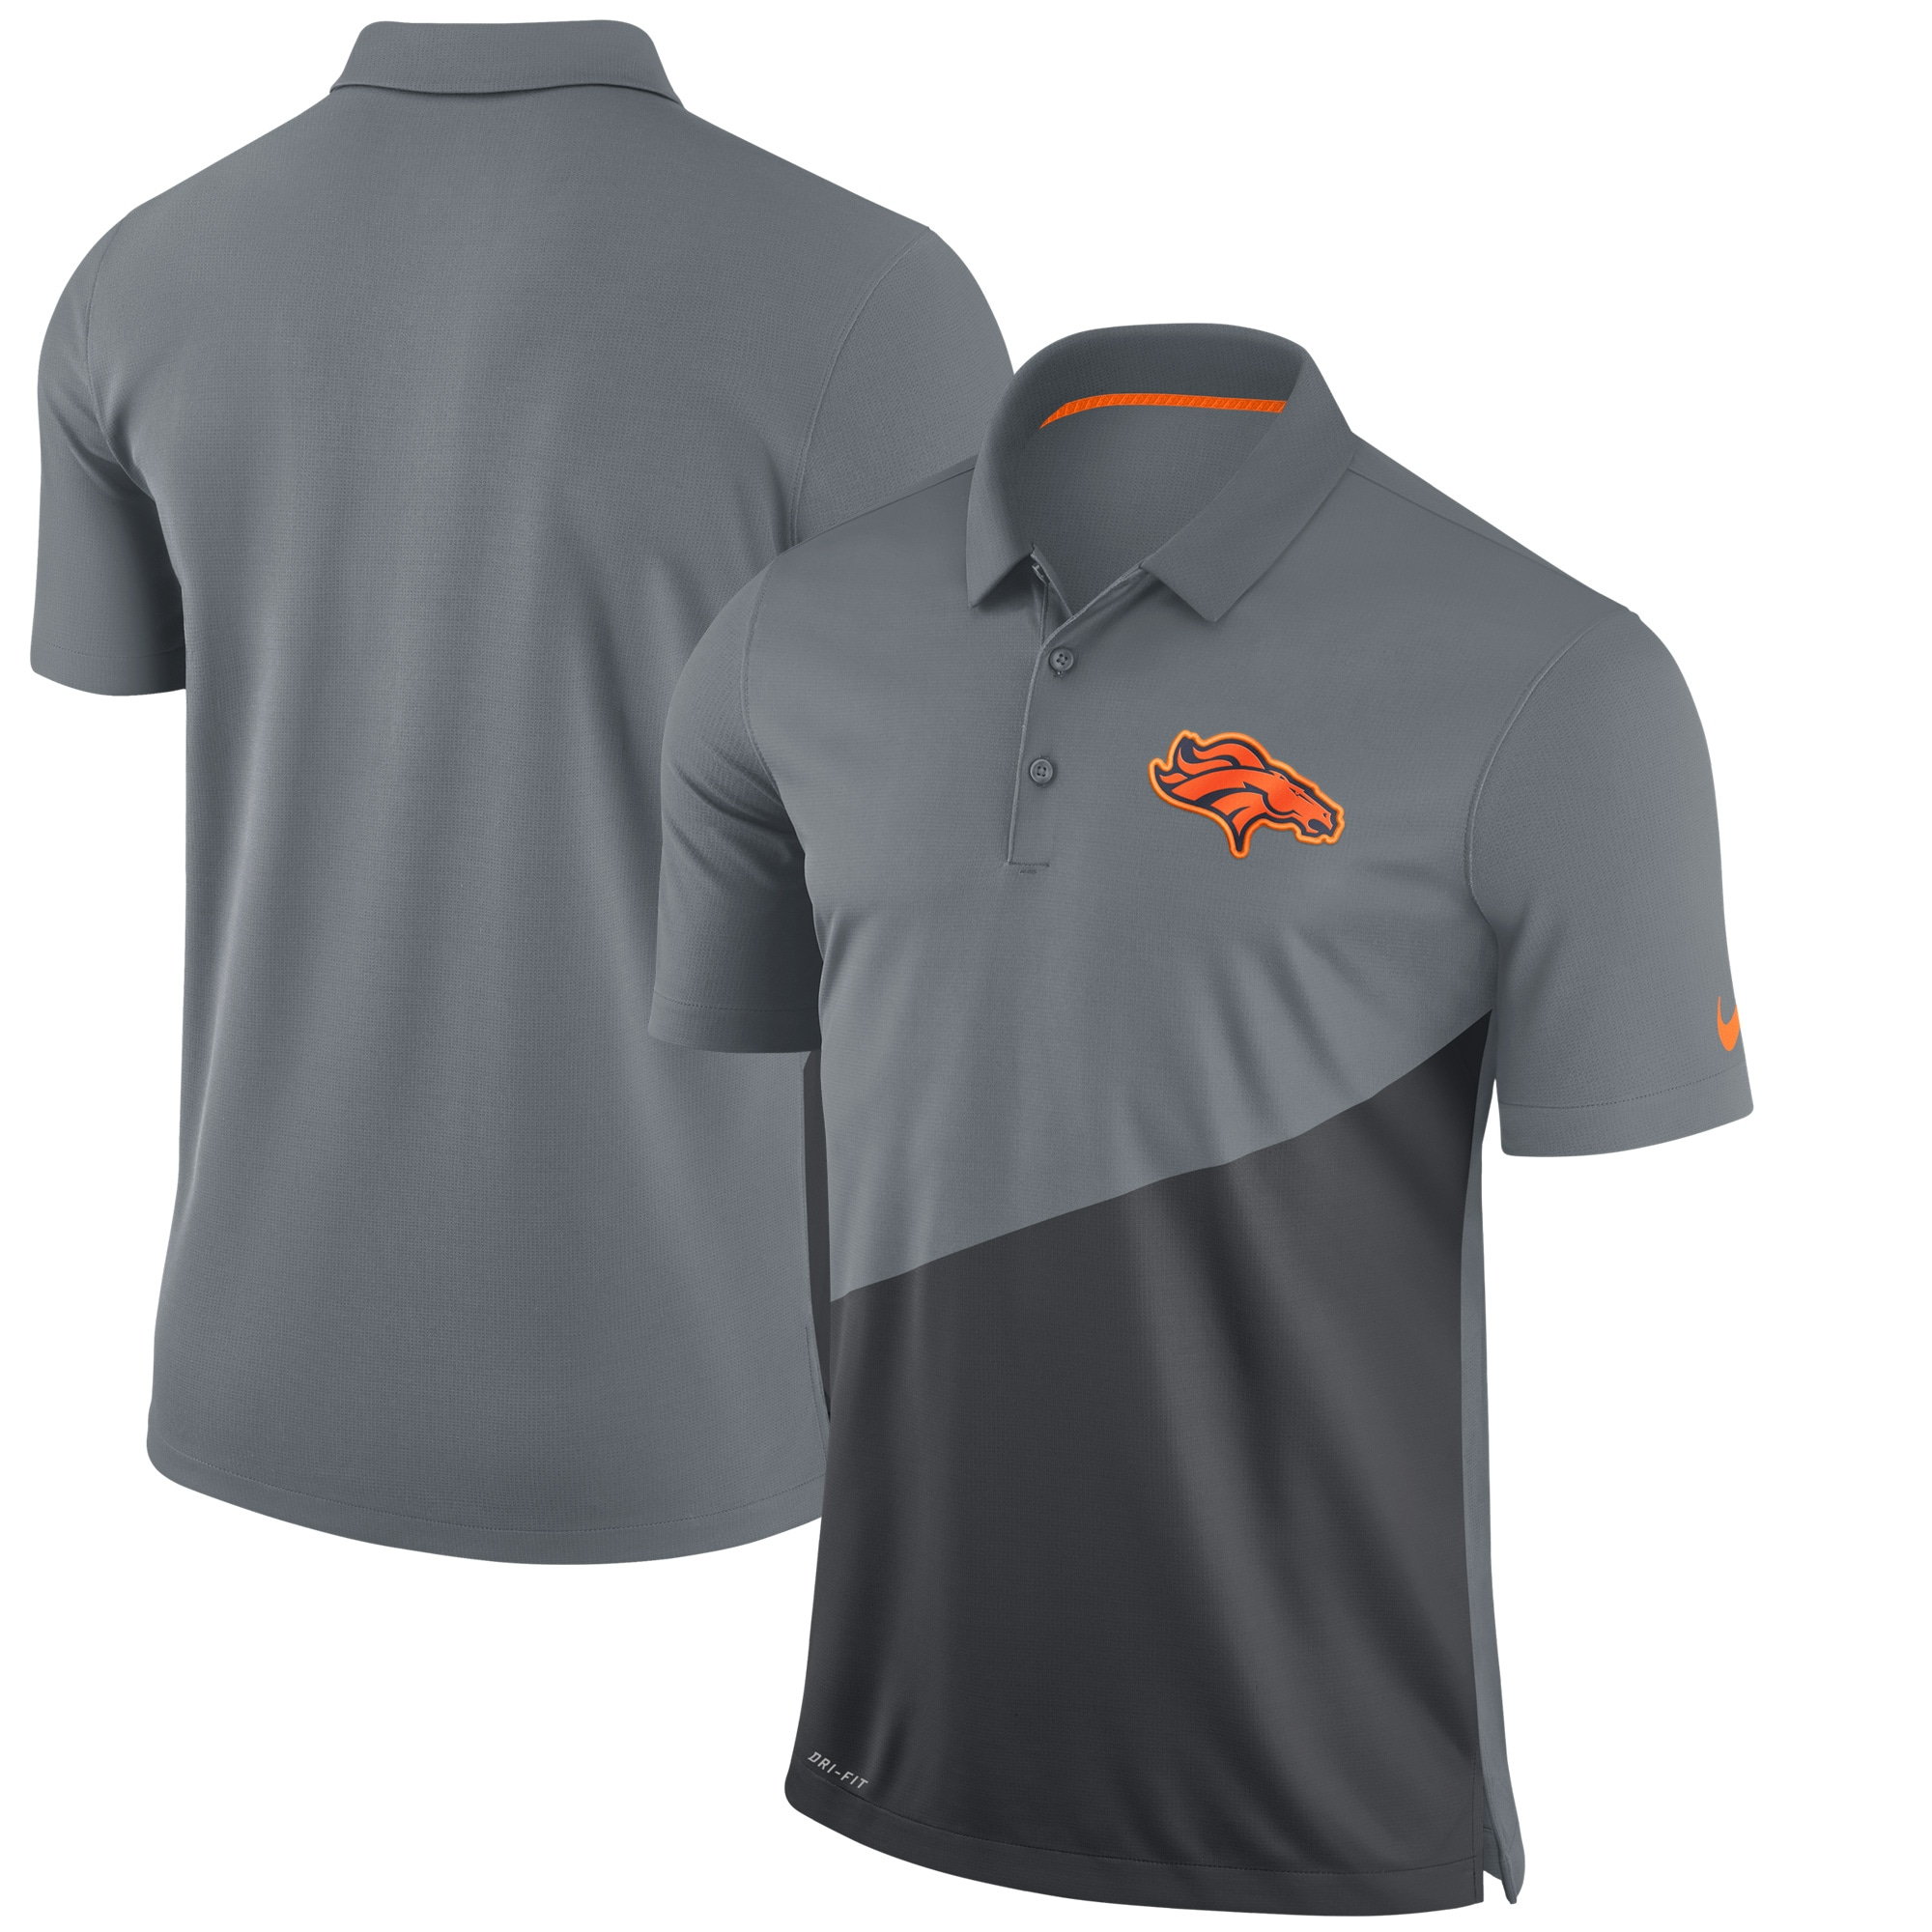 Denver Broncos Nike Stadium Performance Polo - Gray